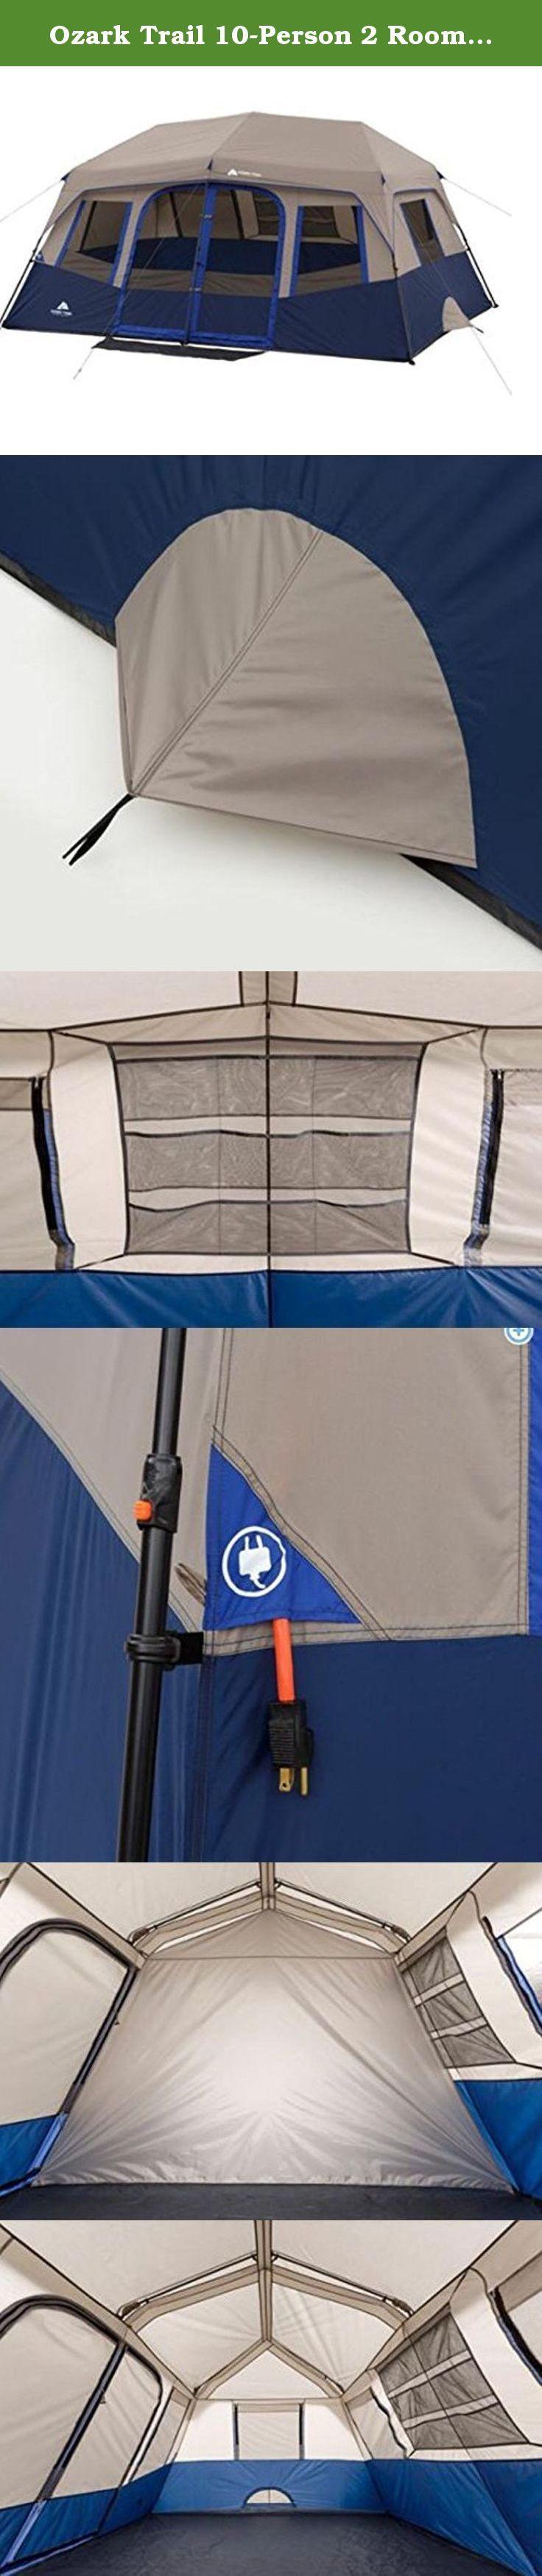 25 Best Ideas About Cabin Tent On Pinterest Solar Power